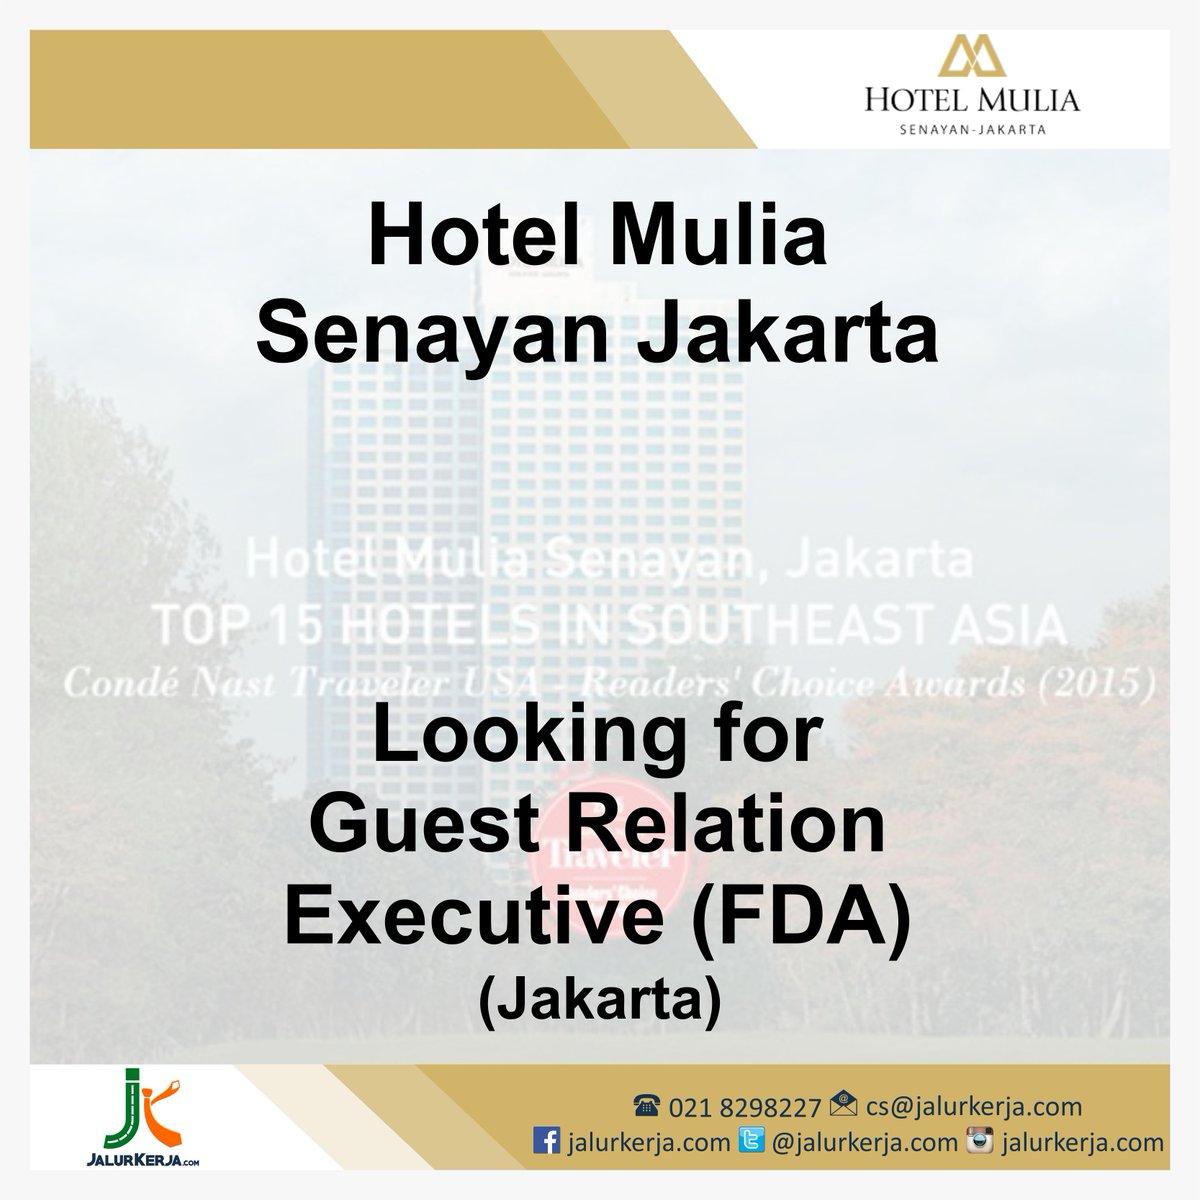 Lowongan Kerja Hotel Jakarta Like And Share